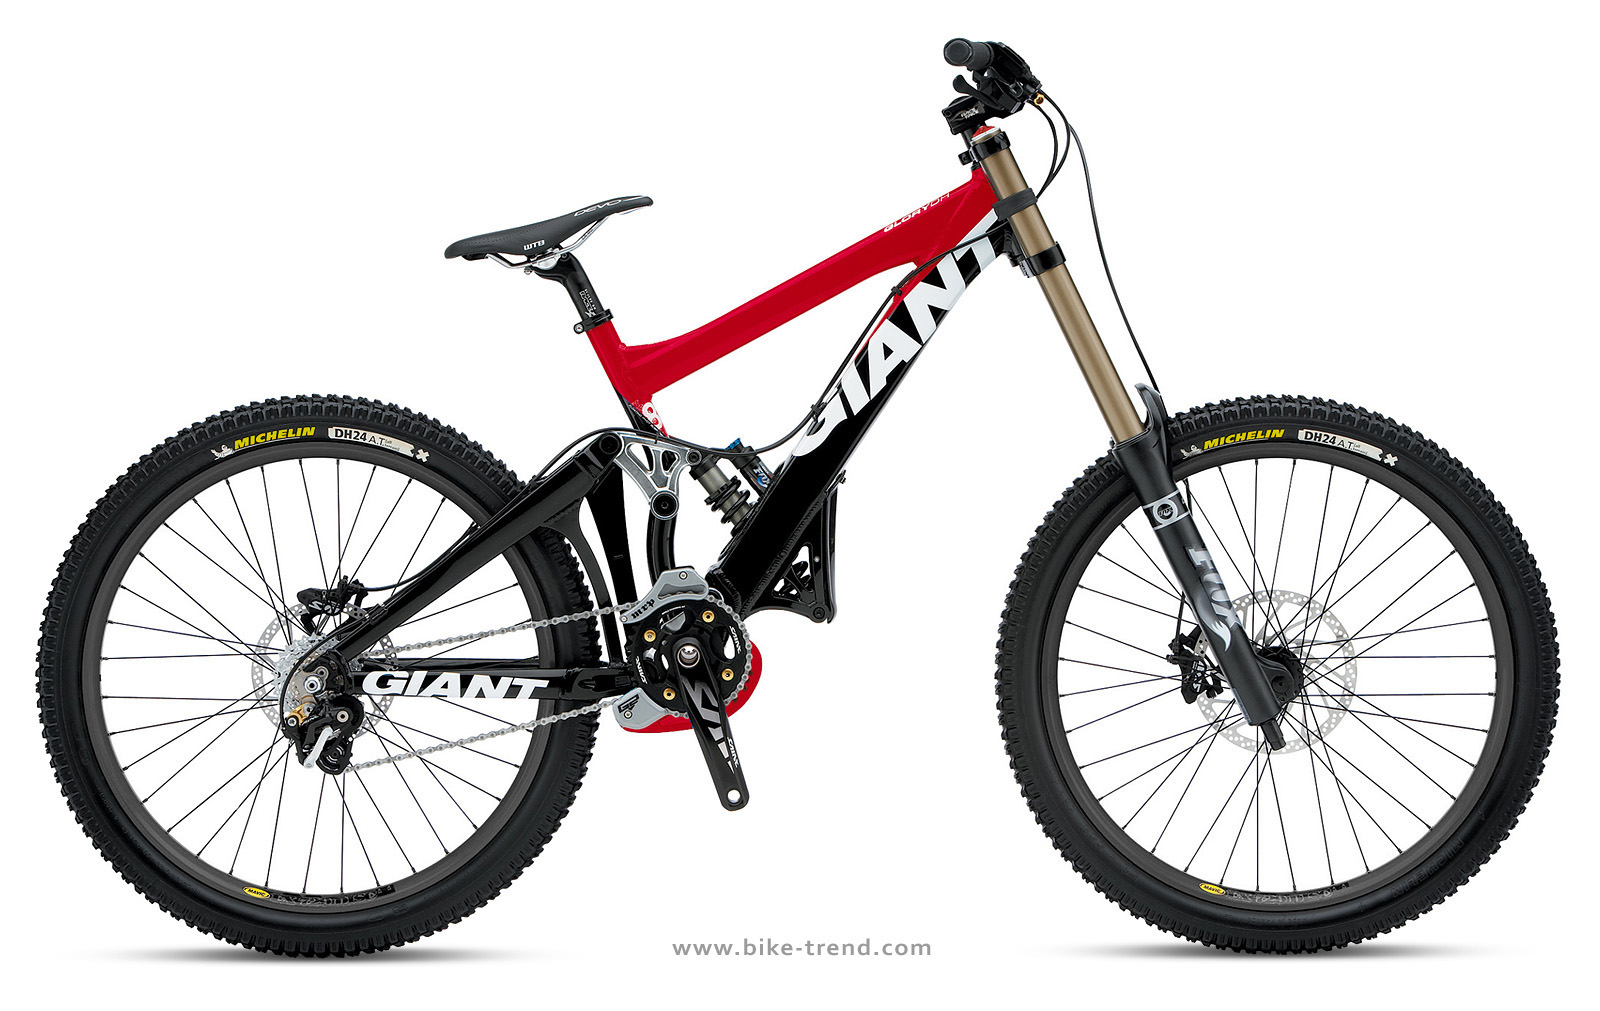 Downhill Bikes Bike Trend Part 2